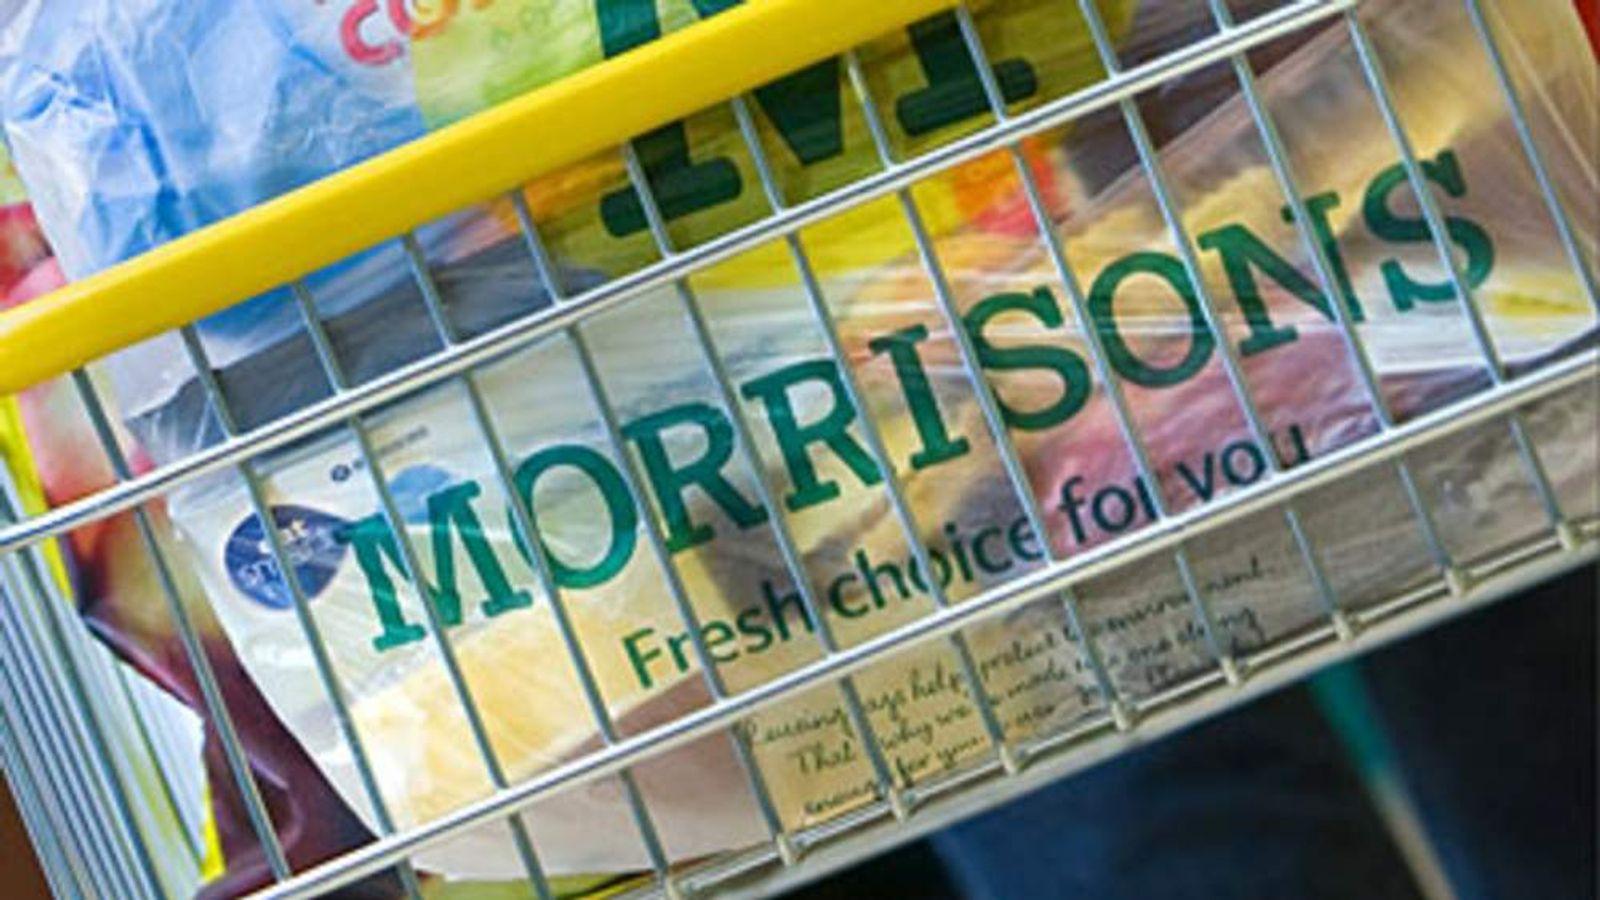 l-morrisons-shopping-bag-in-trolley-supermarket